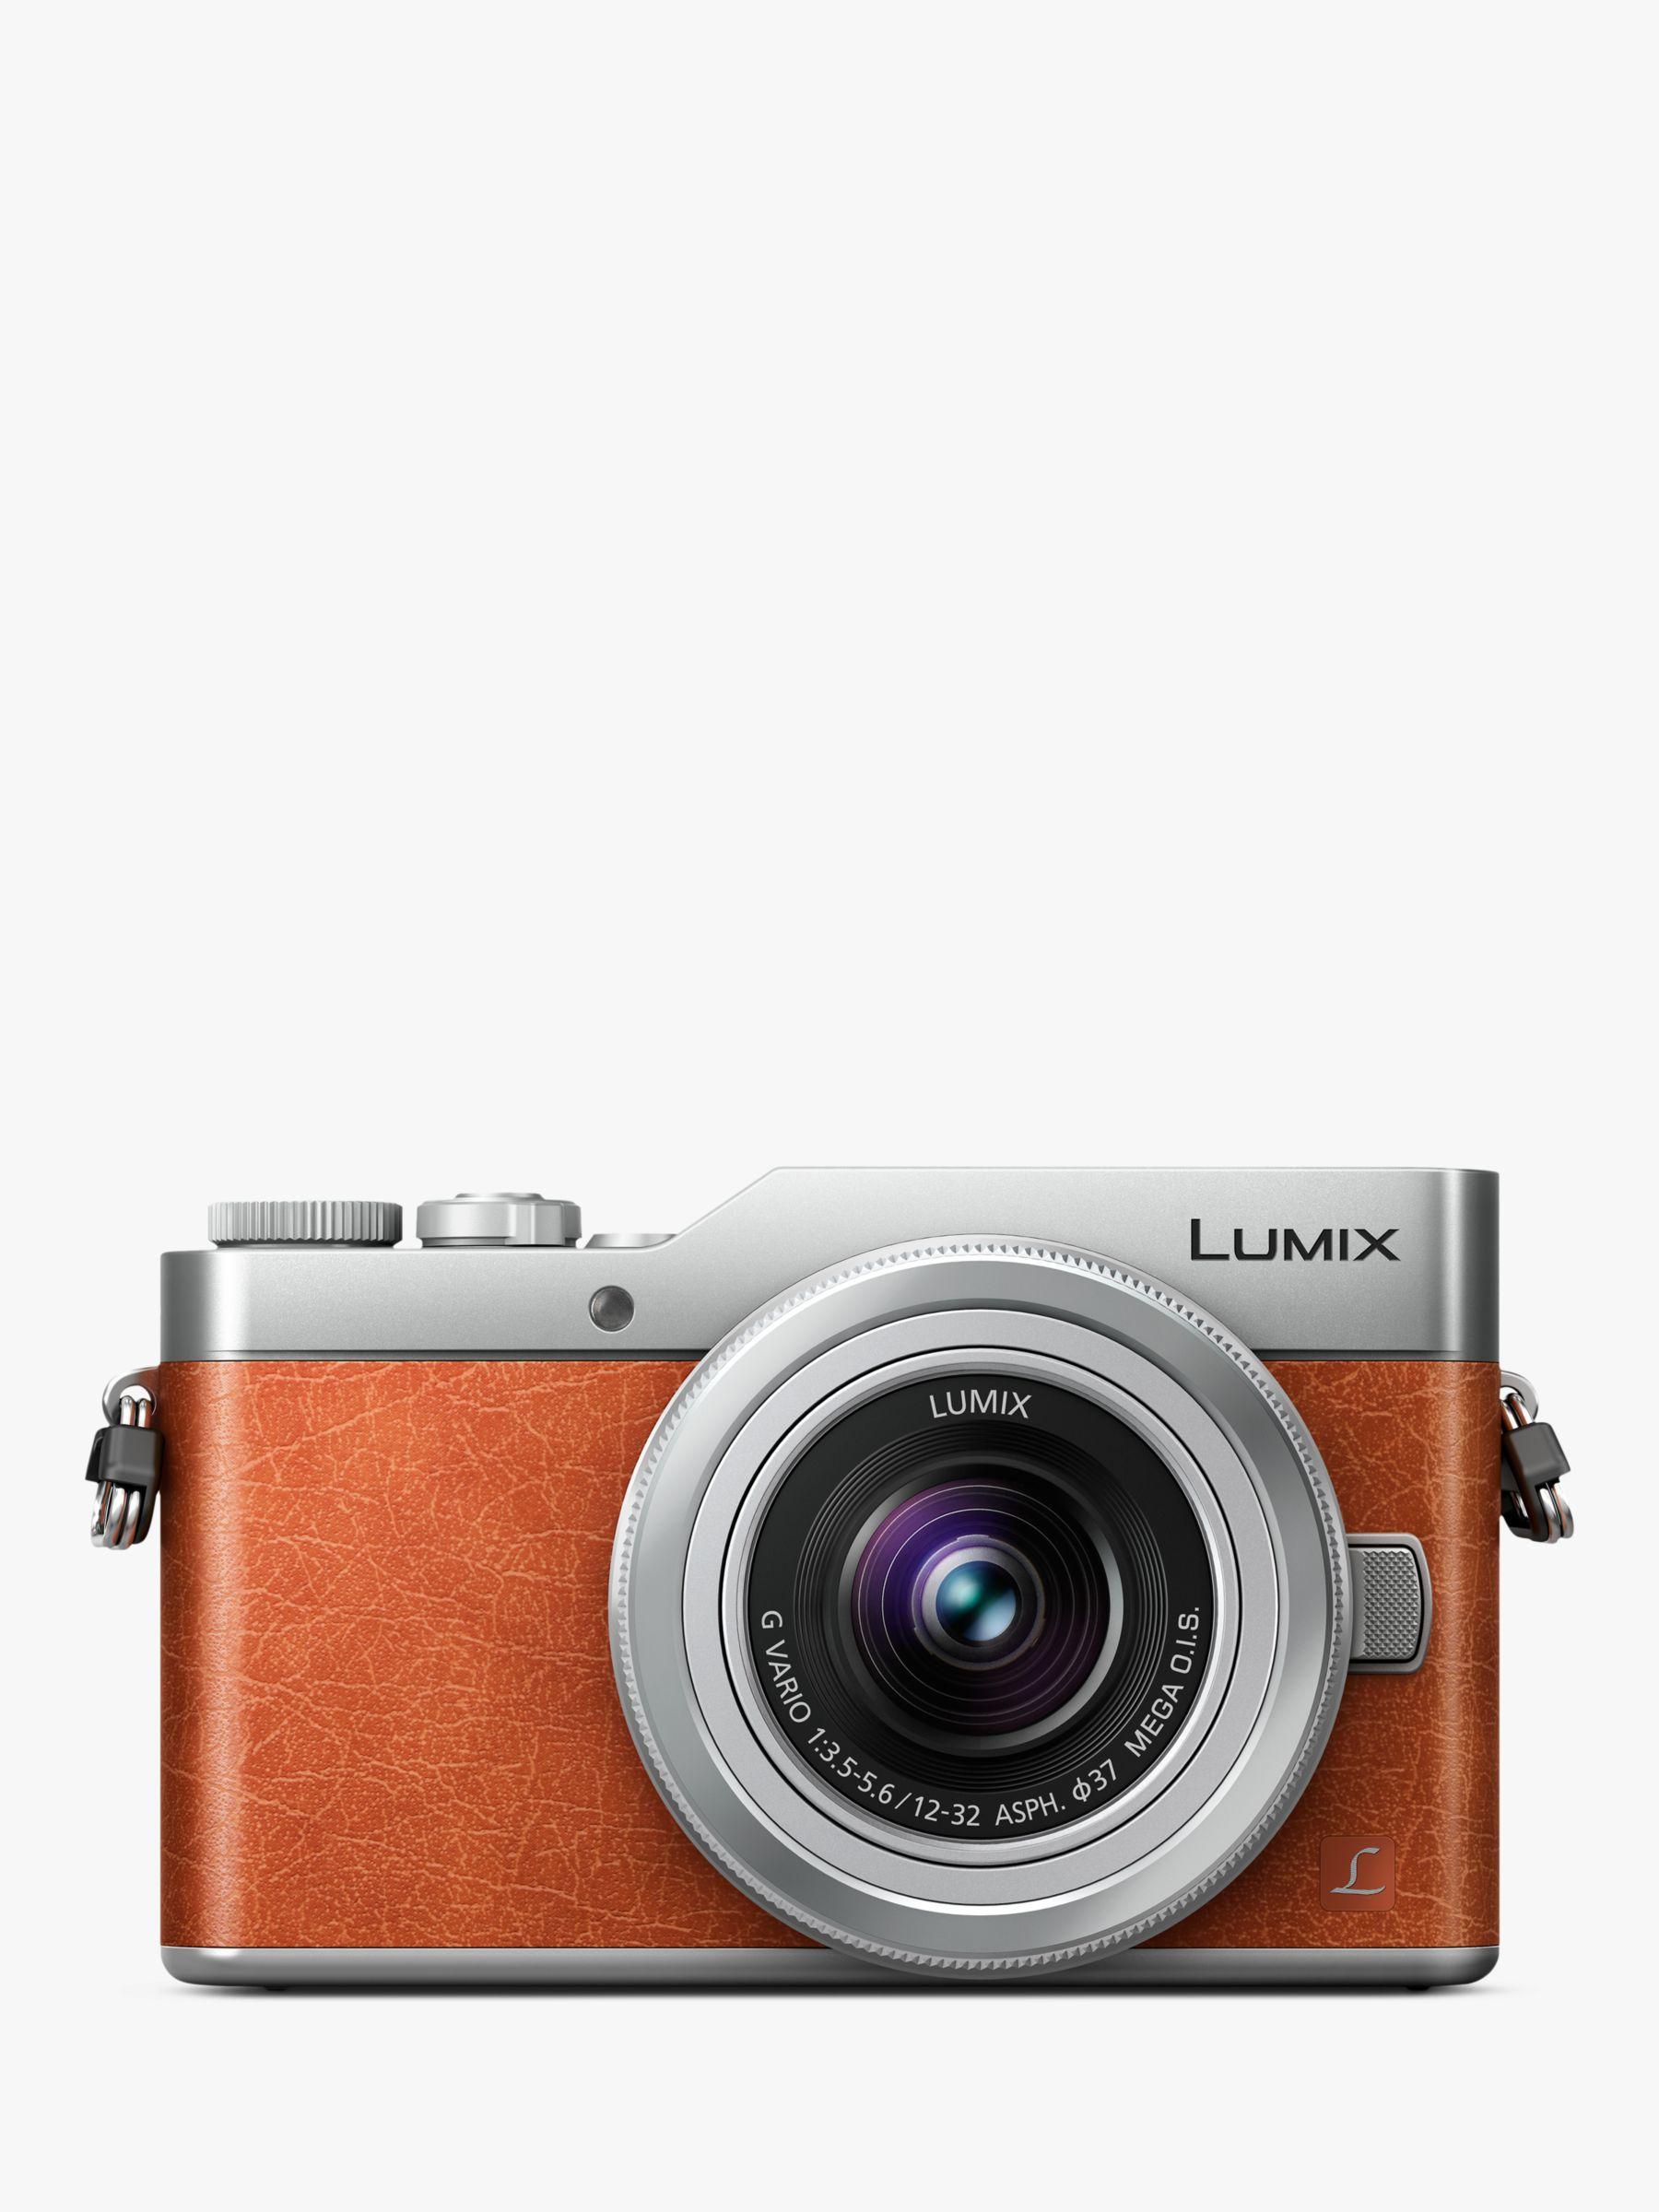 Panasonic Lumix compact system camera